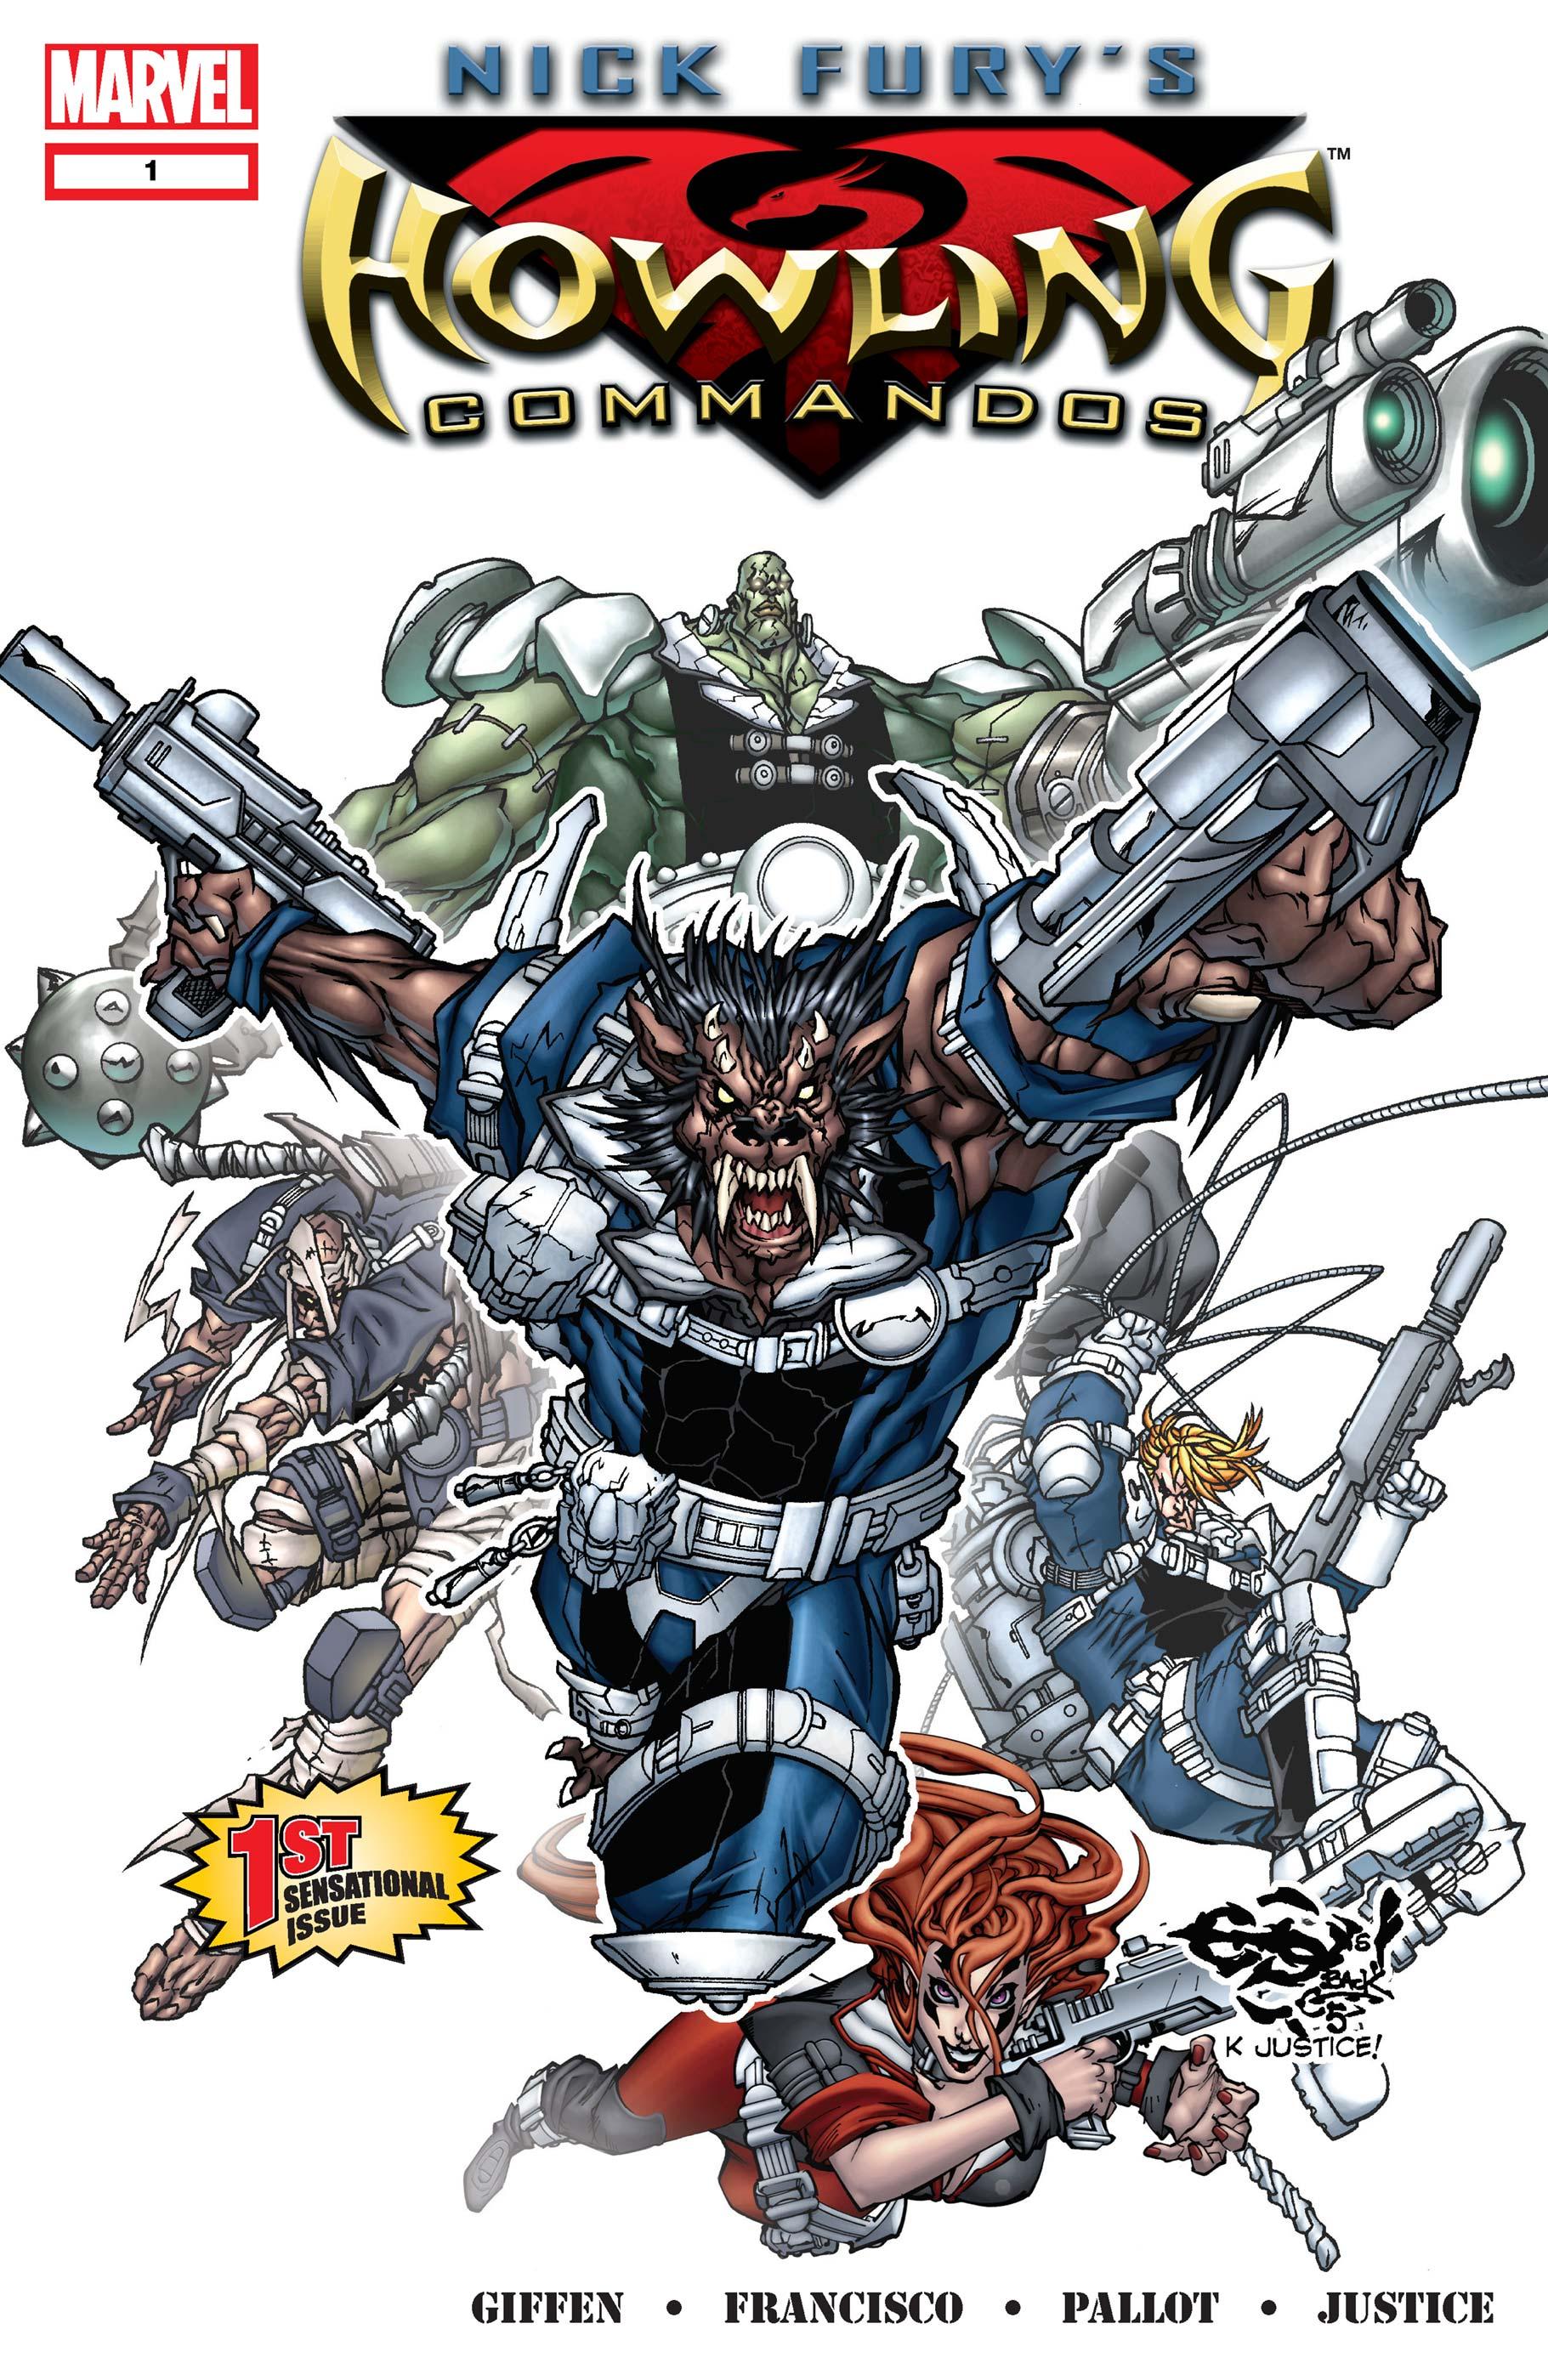 Nick Fury's Howling Commandos (2005) #1